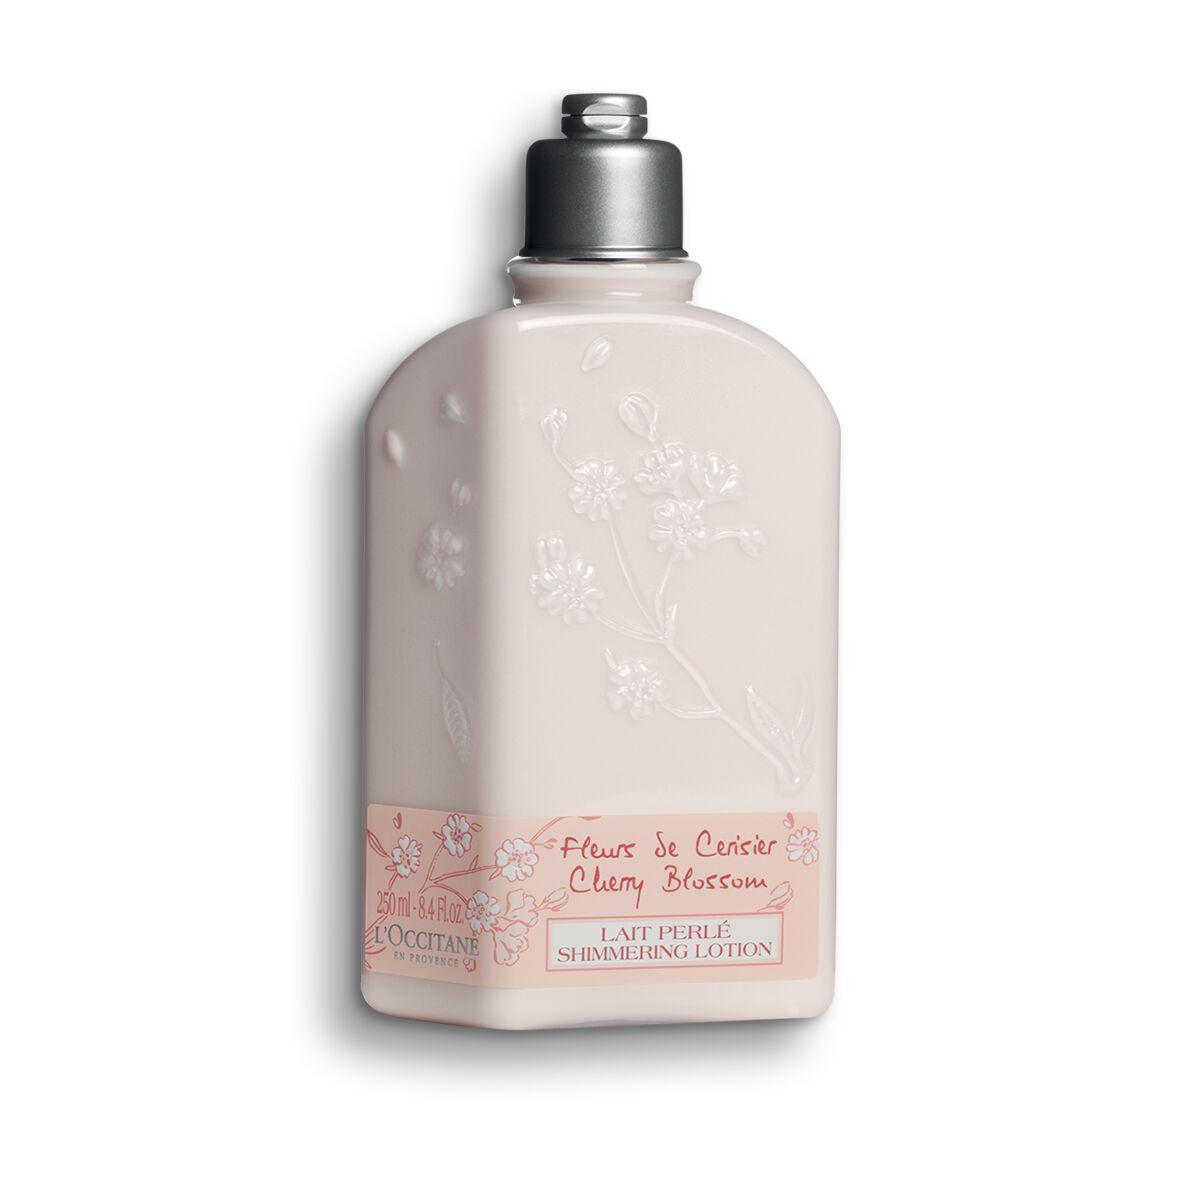 Cherry Blossom Shimmered Lotion 8.4 fl. oz.